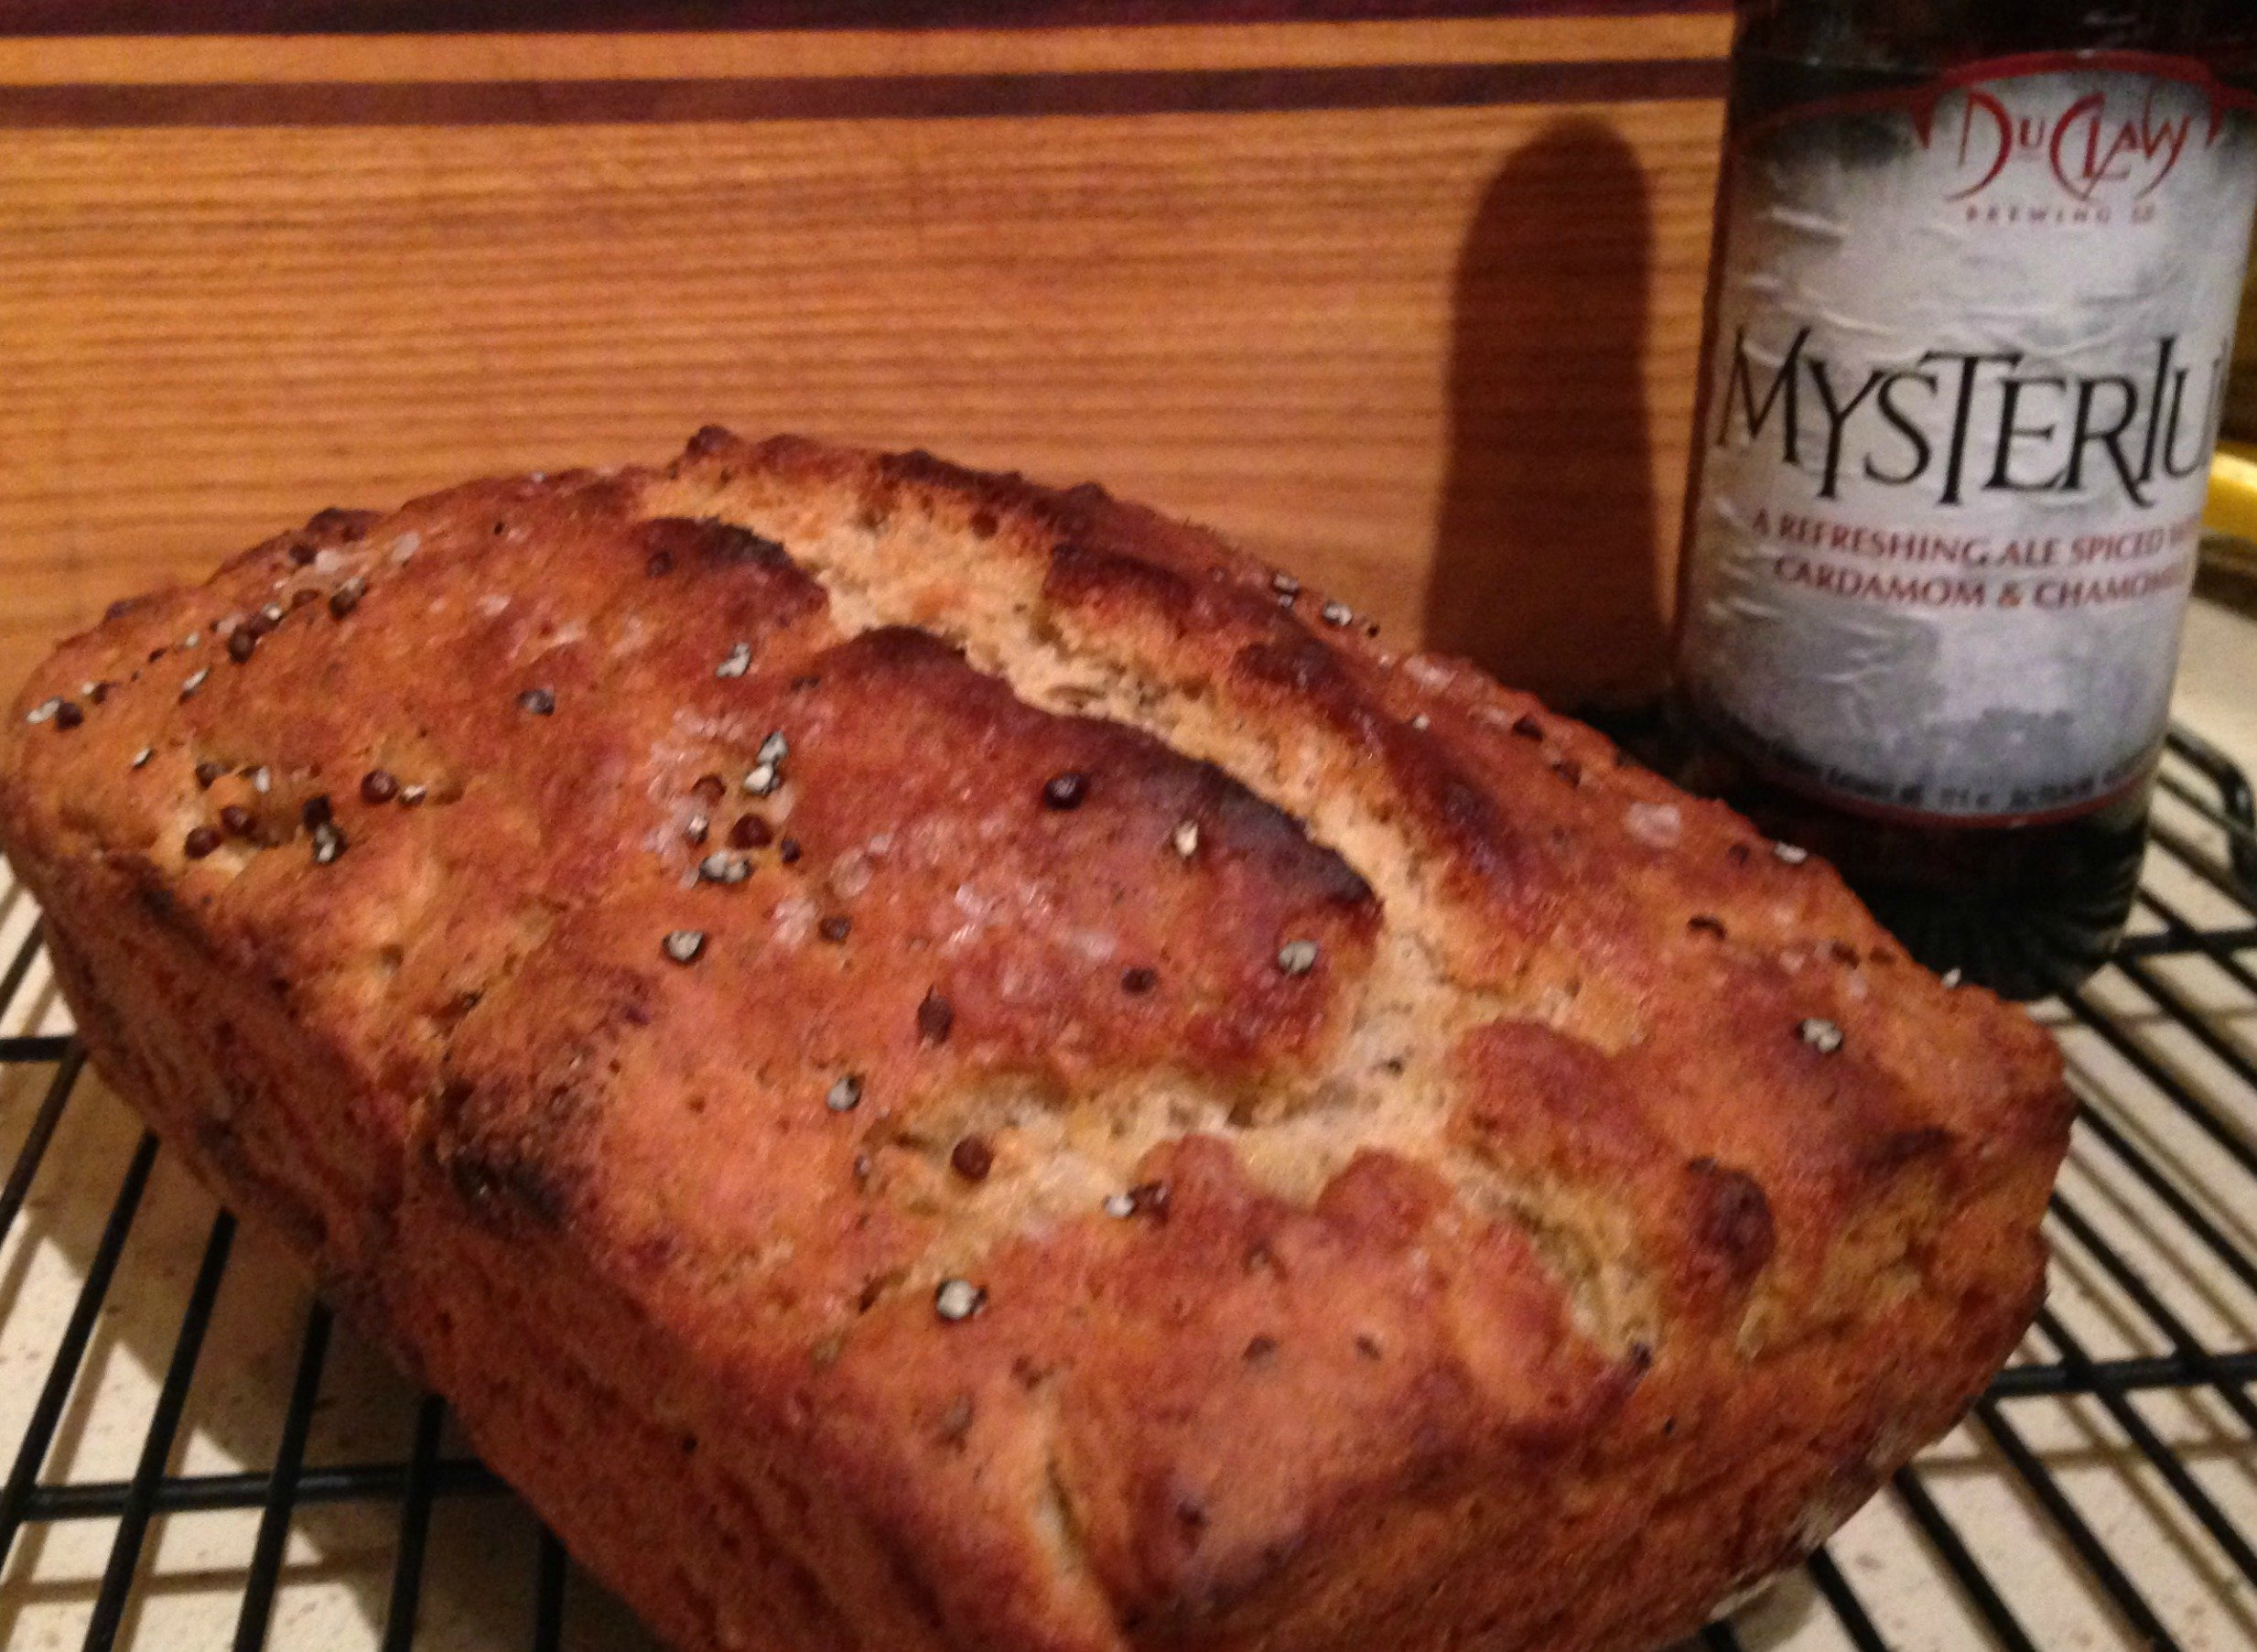 mysterium-bread